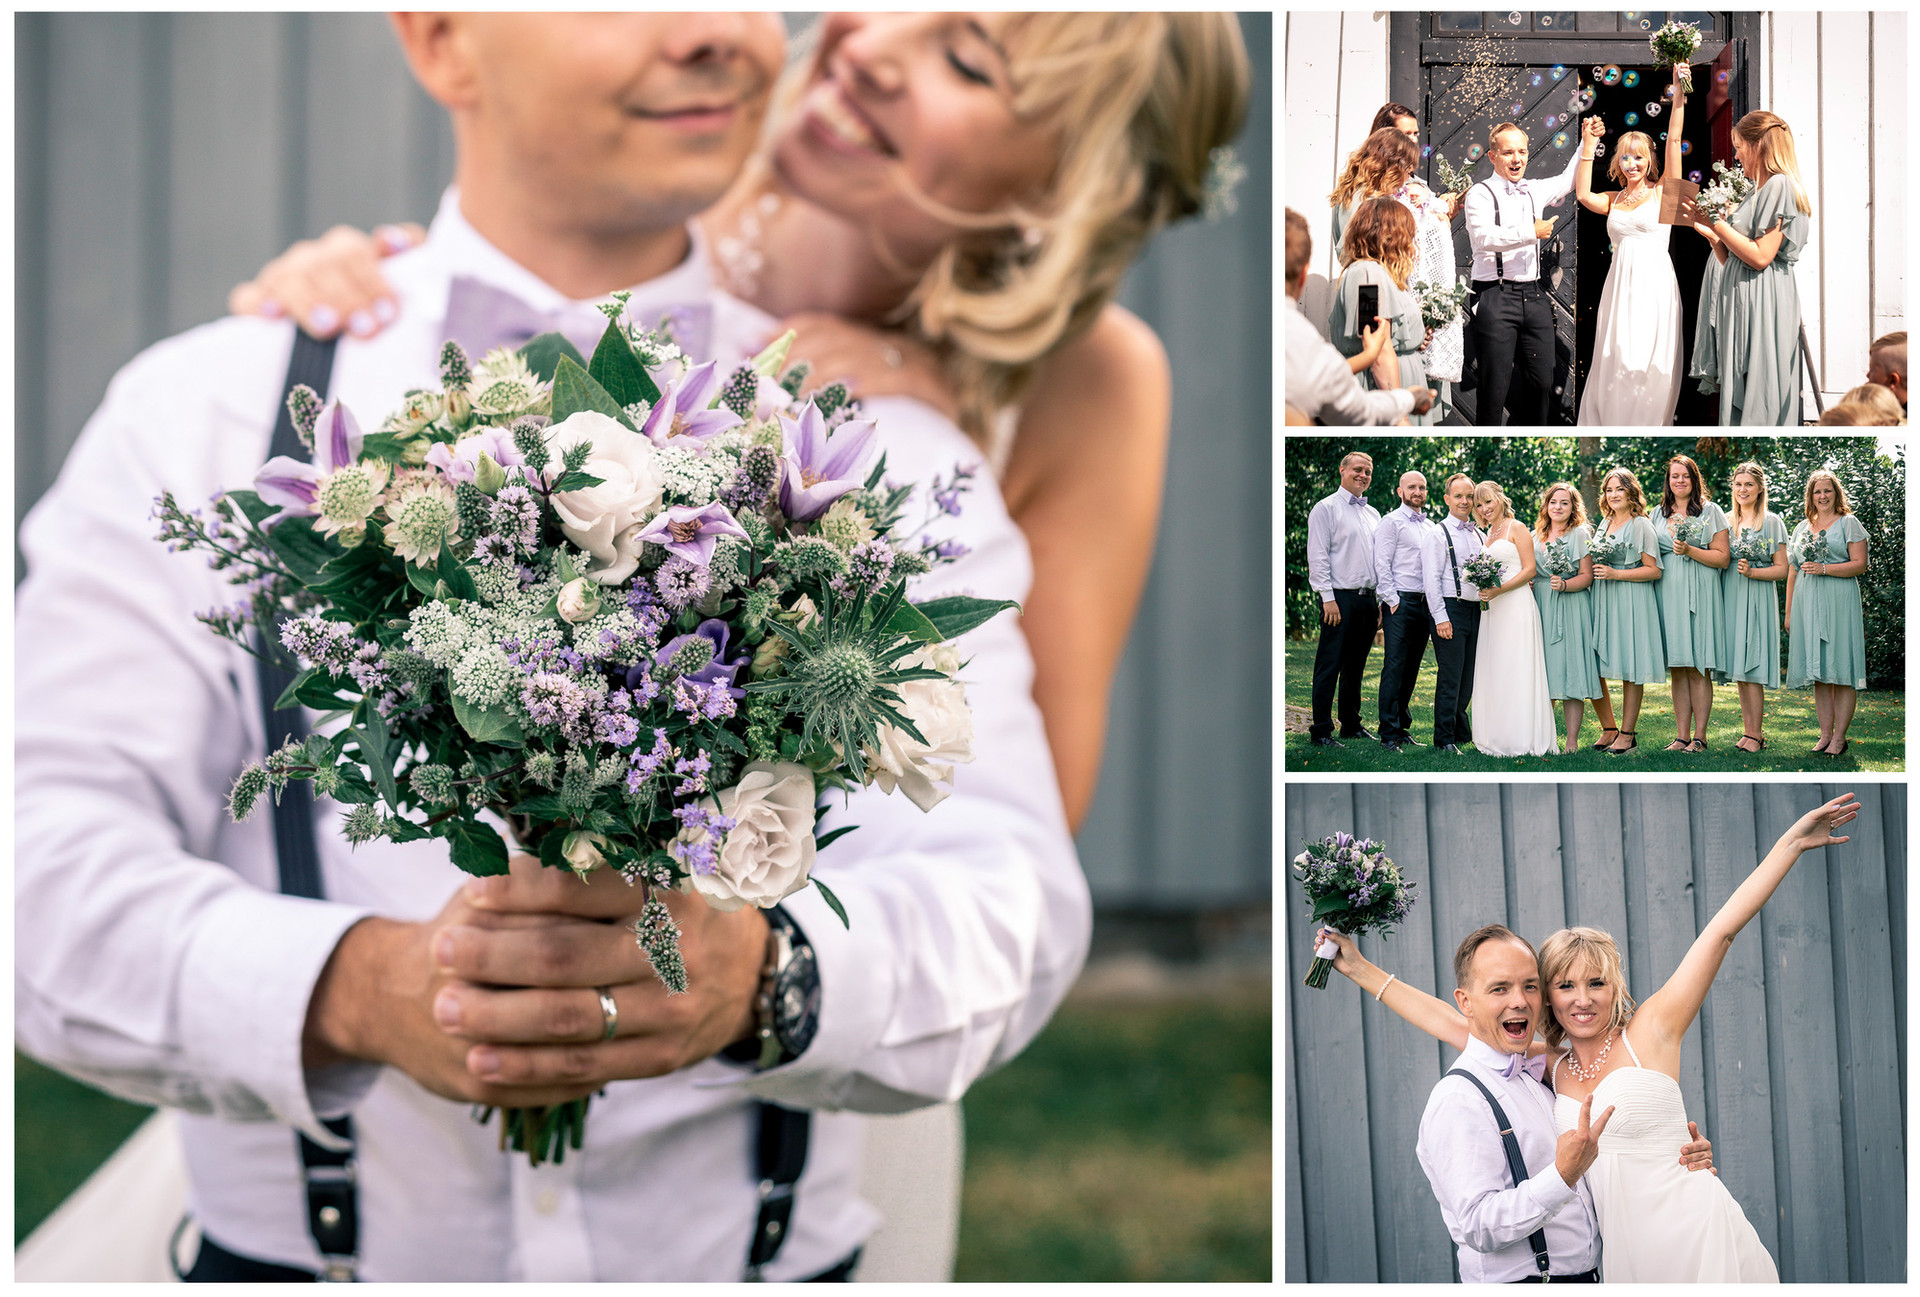 Wedding-Photography-Goteborg-01.jpg